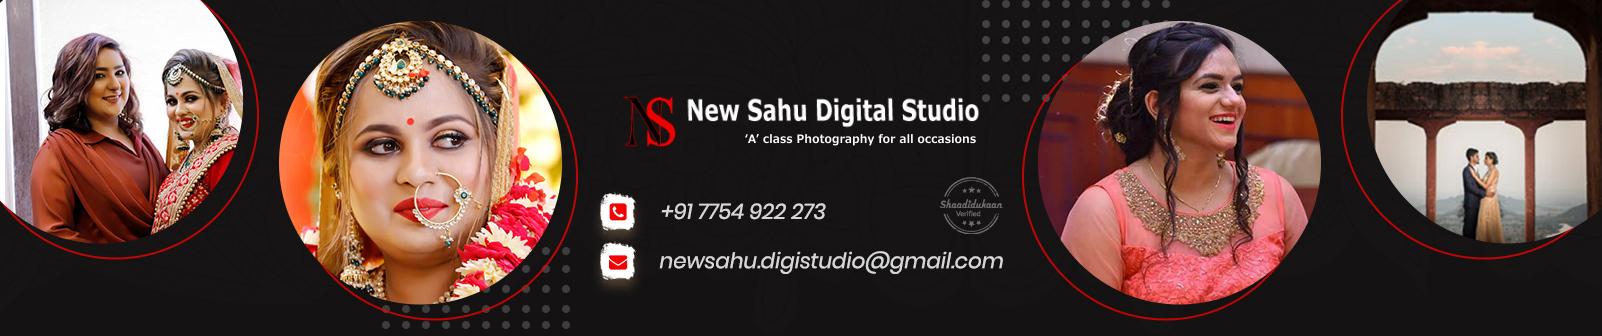 new-sahu-digital-studio